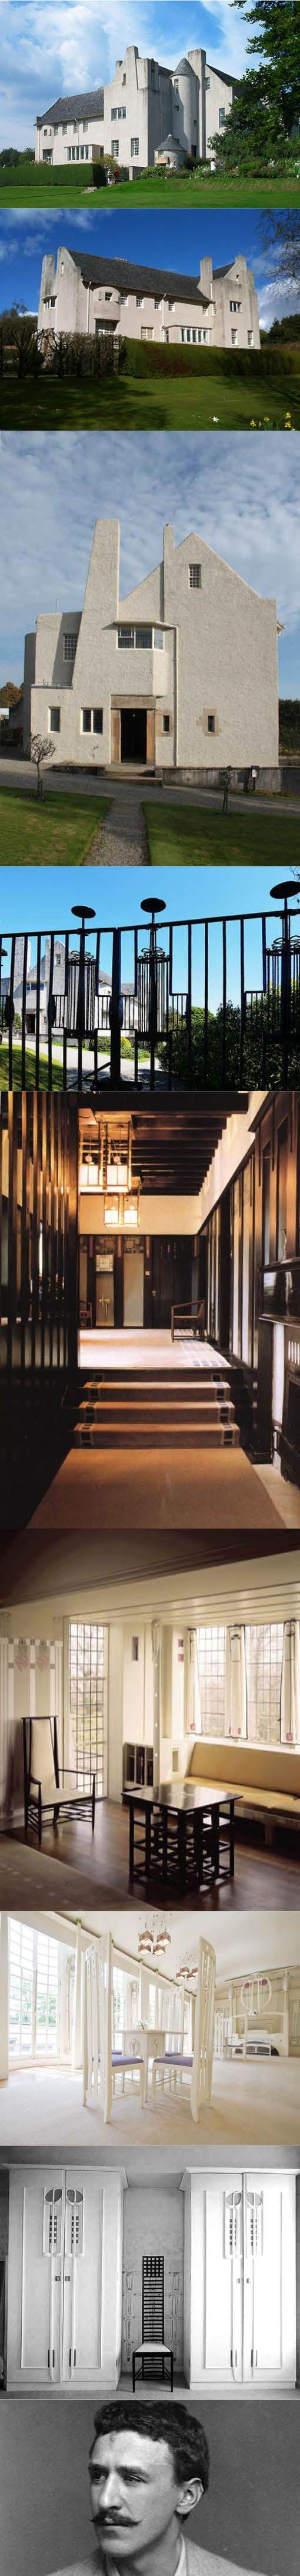 1902-1904 Charles Rennie Mackintosh - Hill house / Helensburgh Scotland UK / concrete / white / art nouveau